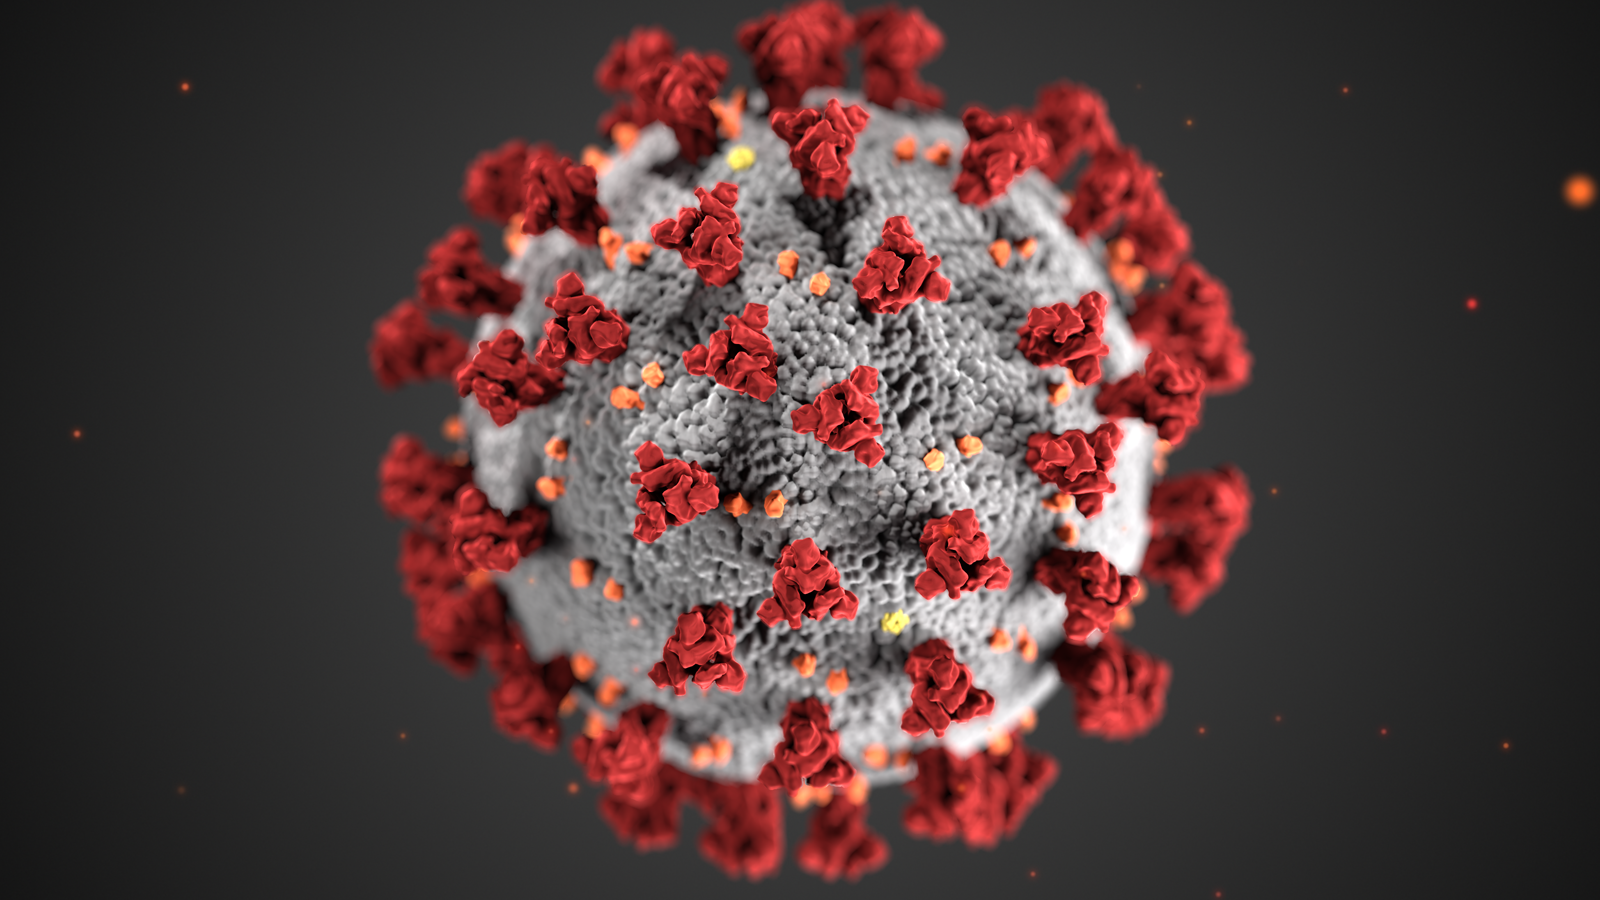 corona virus up close